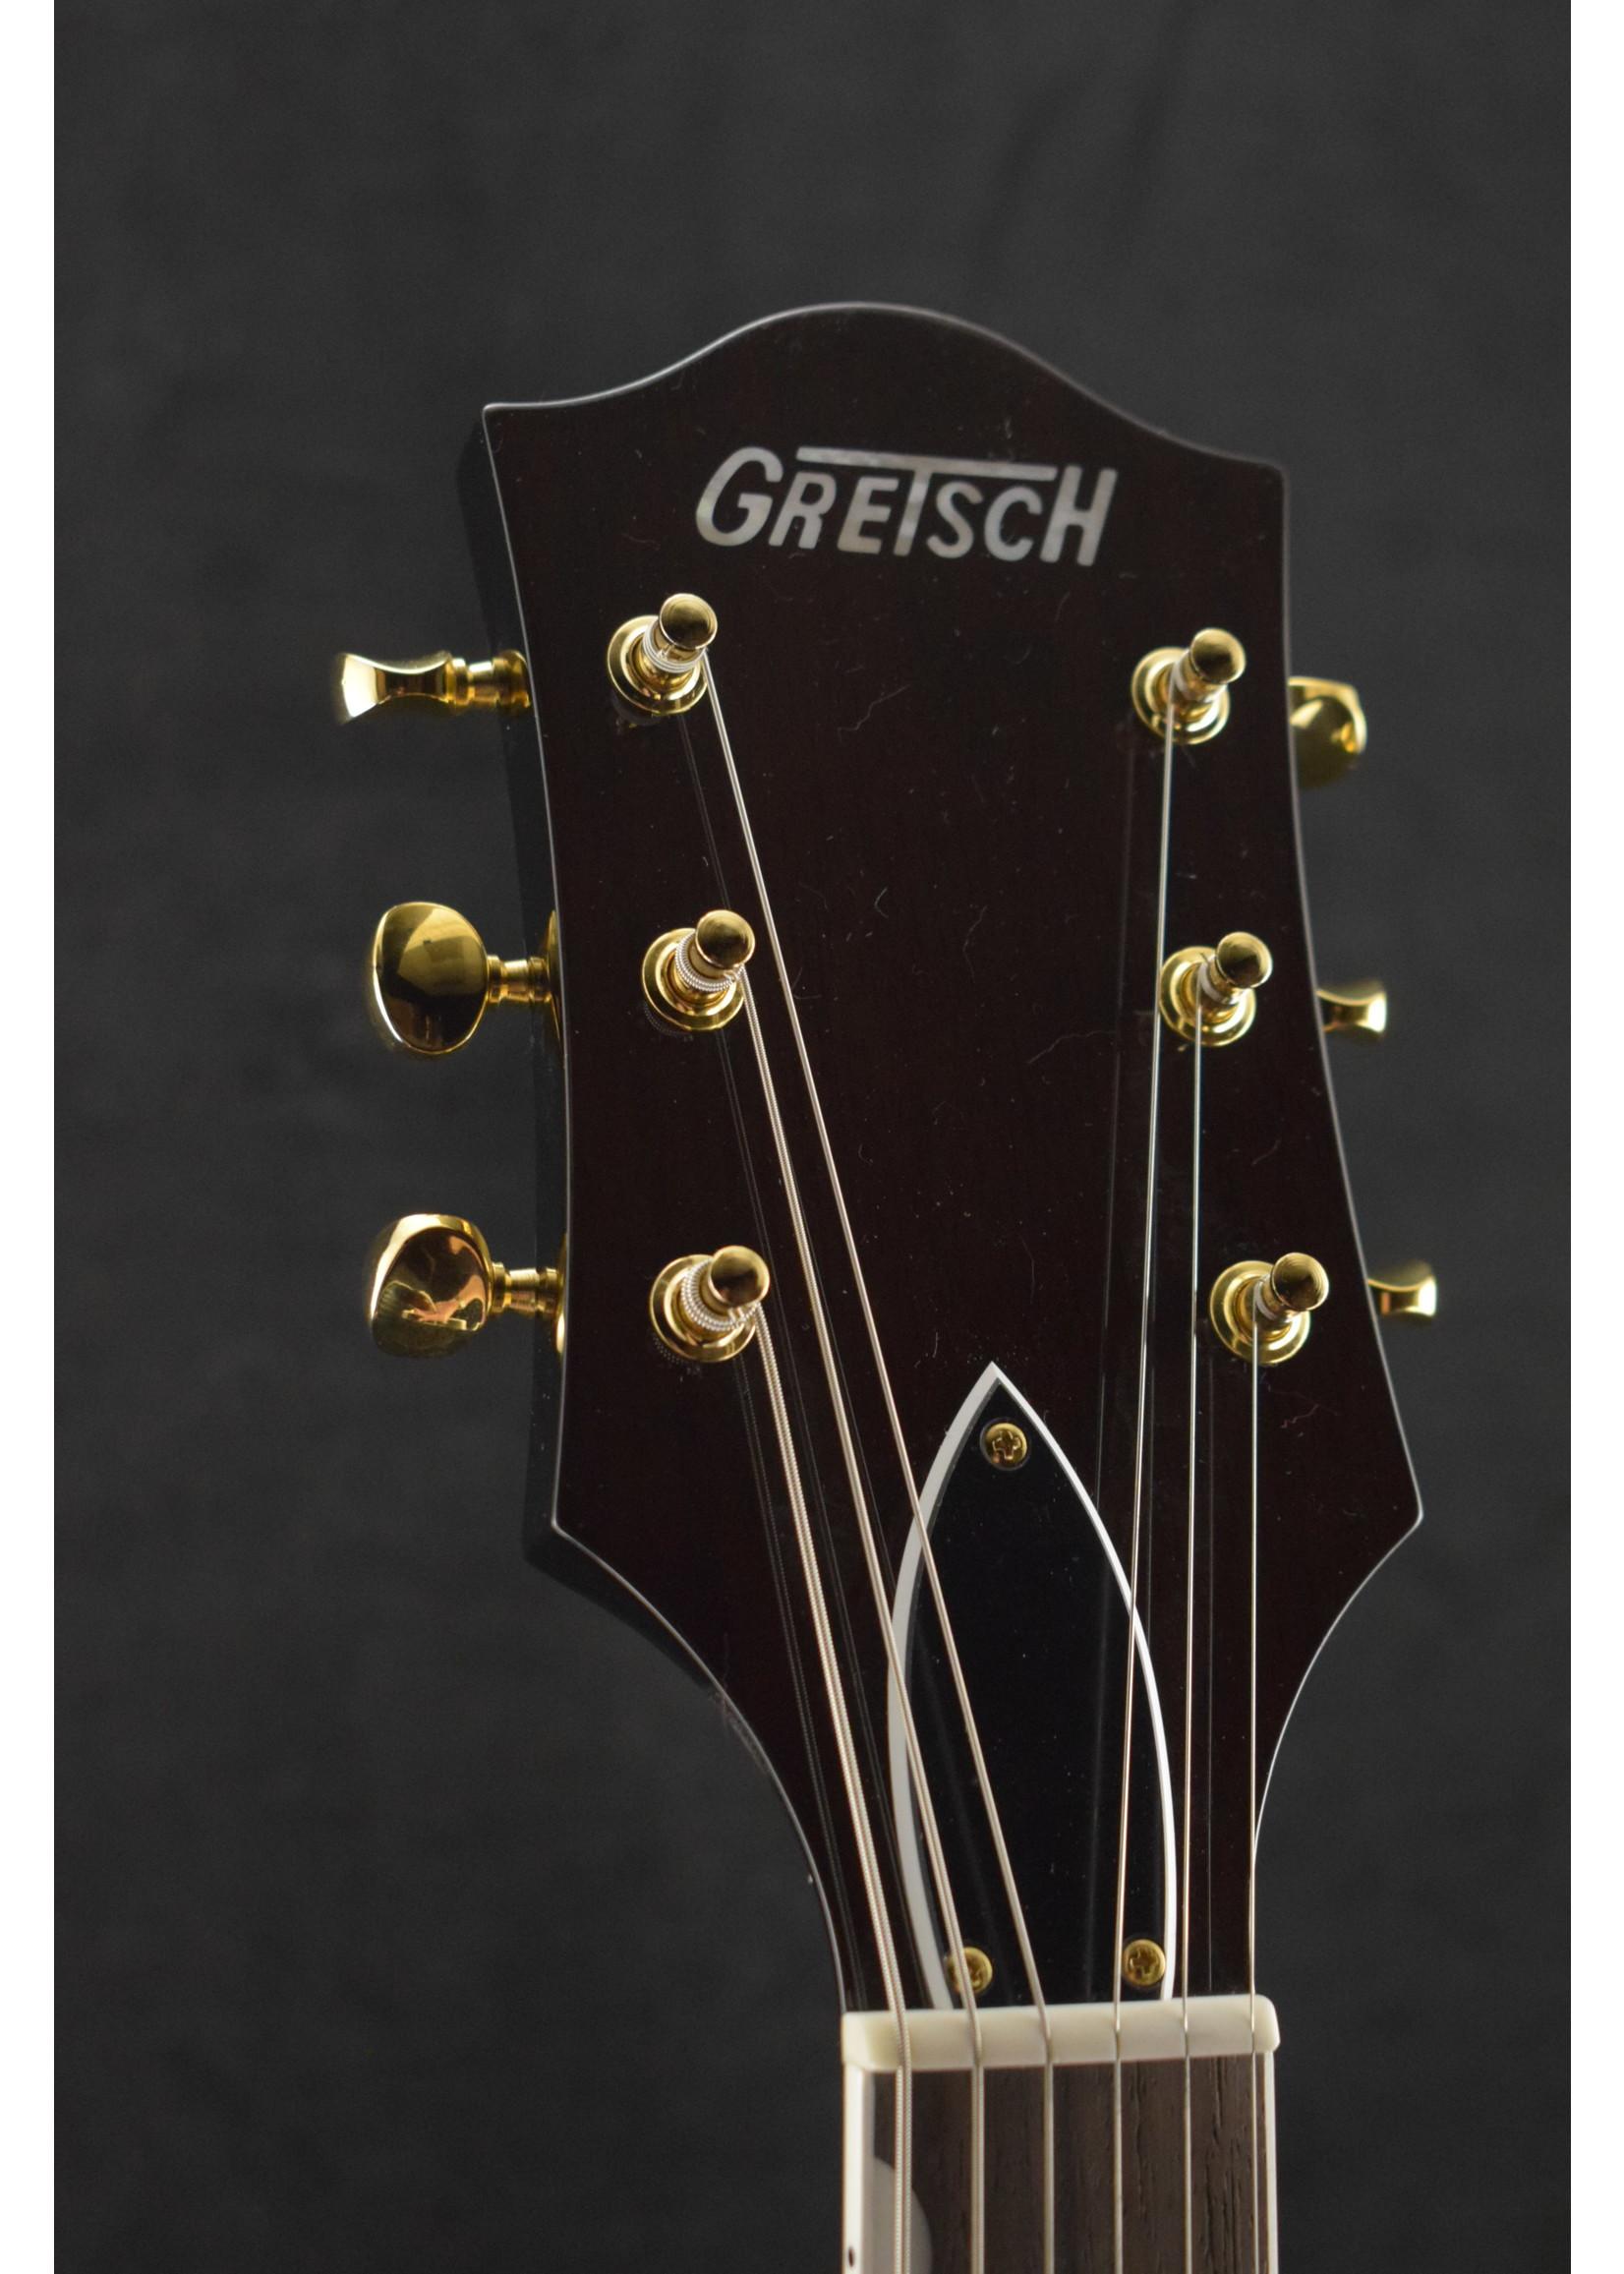 Gretsch Gretsch G6119TG-62RW-LTD '62 Rosewood Tenny with Bigsby Natural